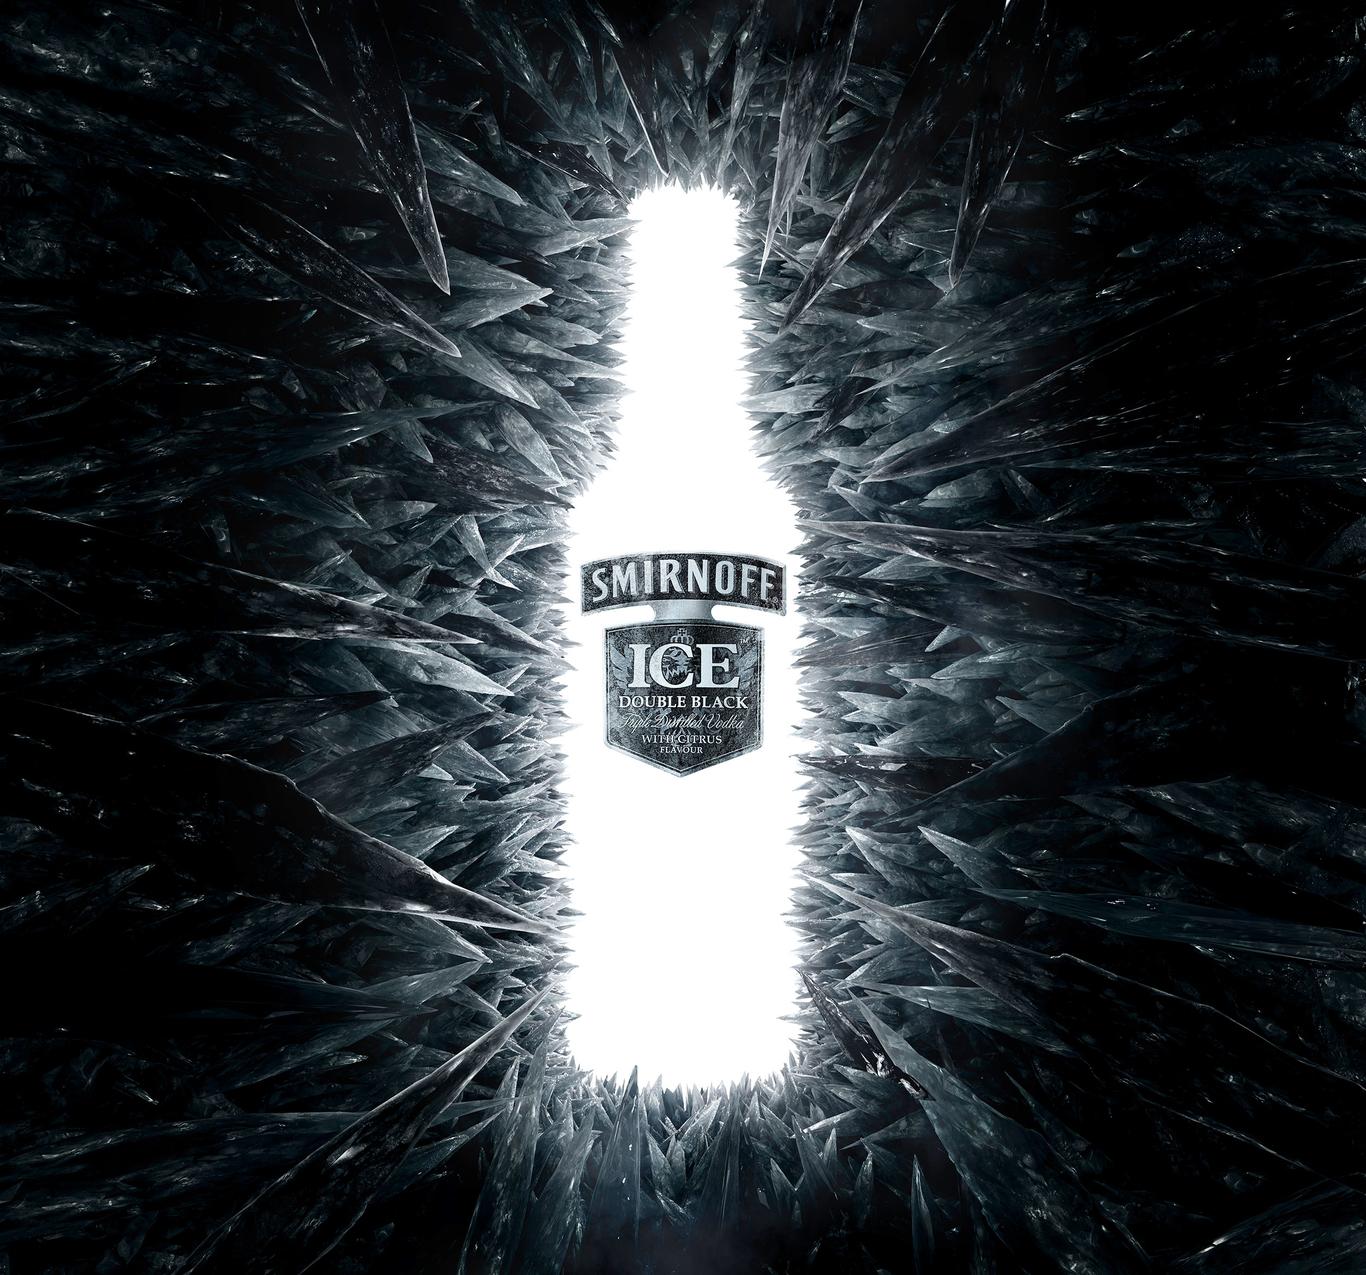 Sathe smirnoff black ice 1 6bf9e572 zf17